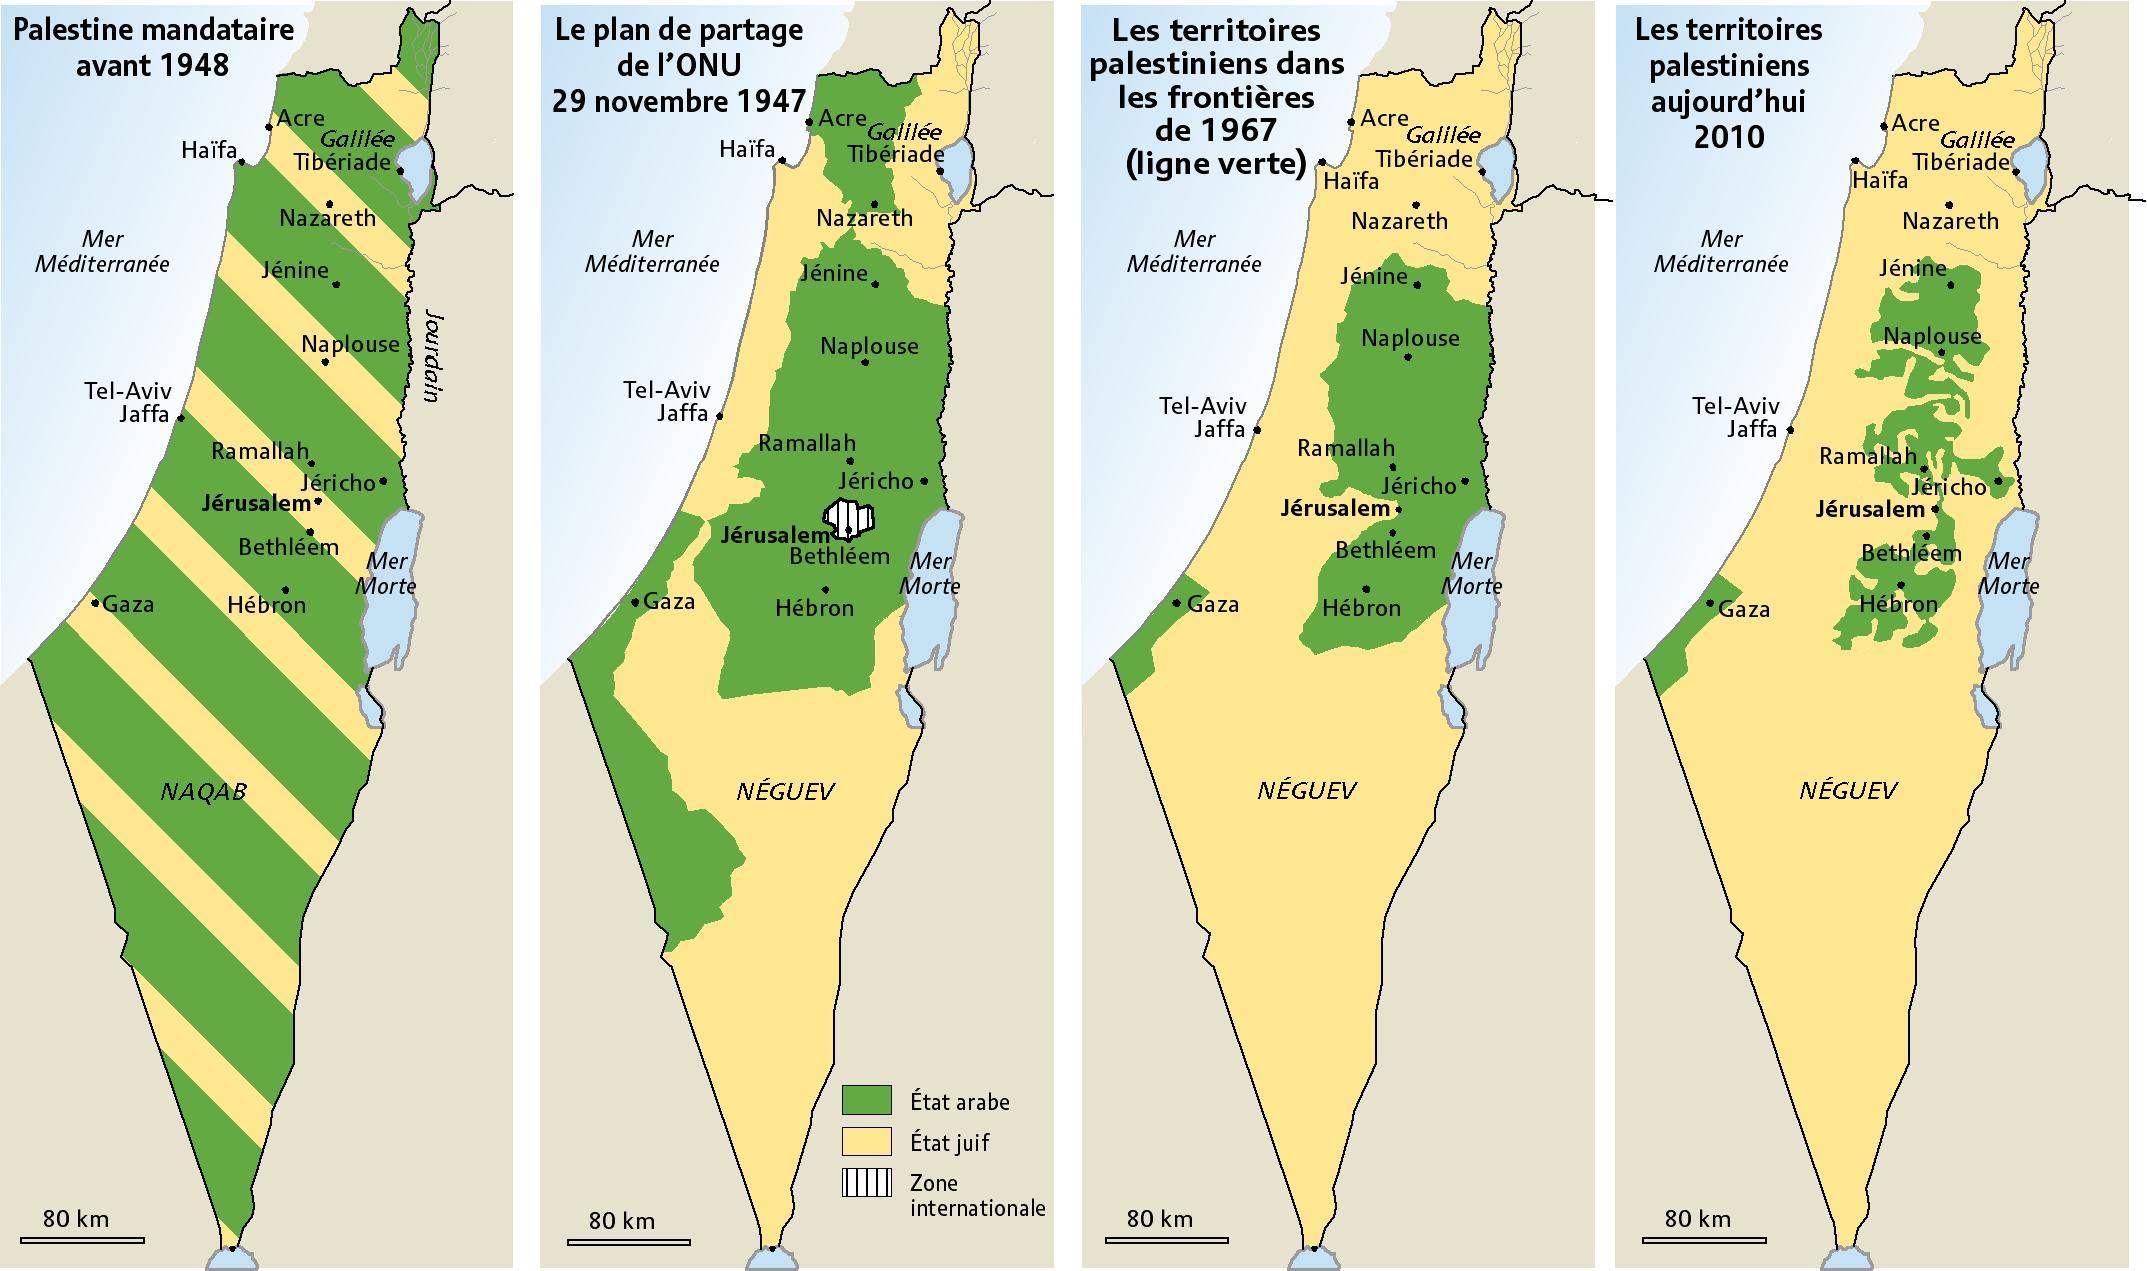 image-de-la-carte-de-palestine